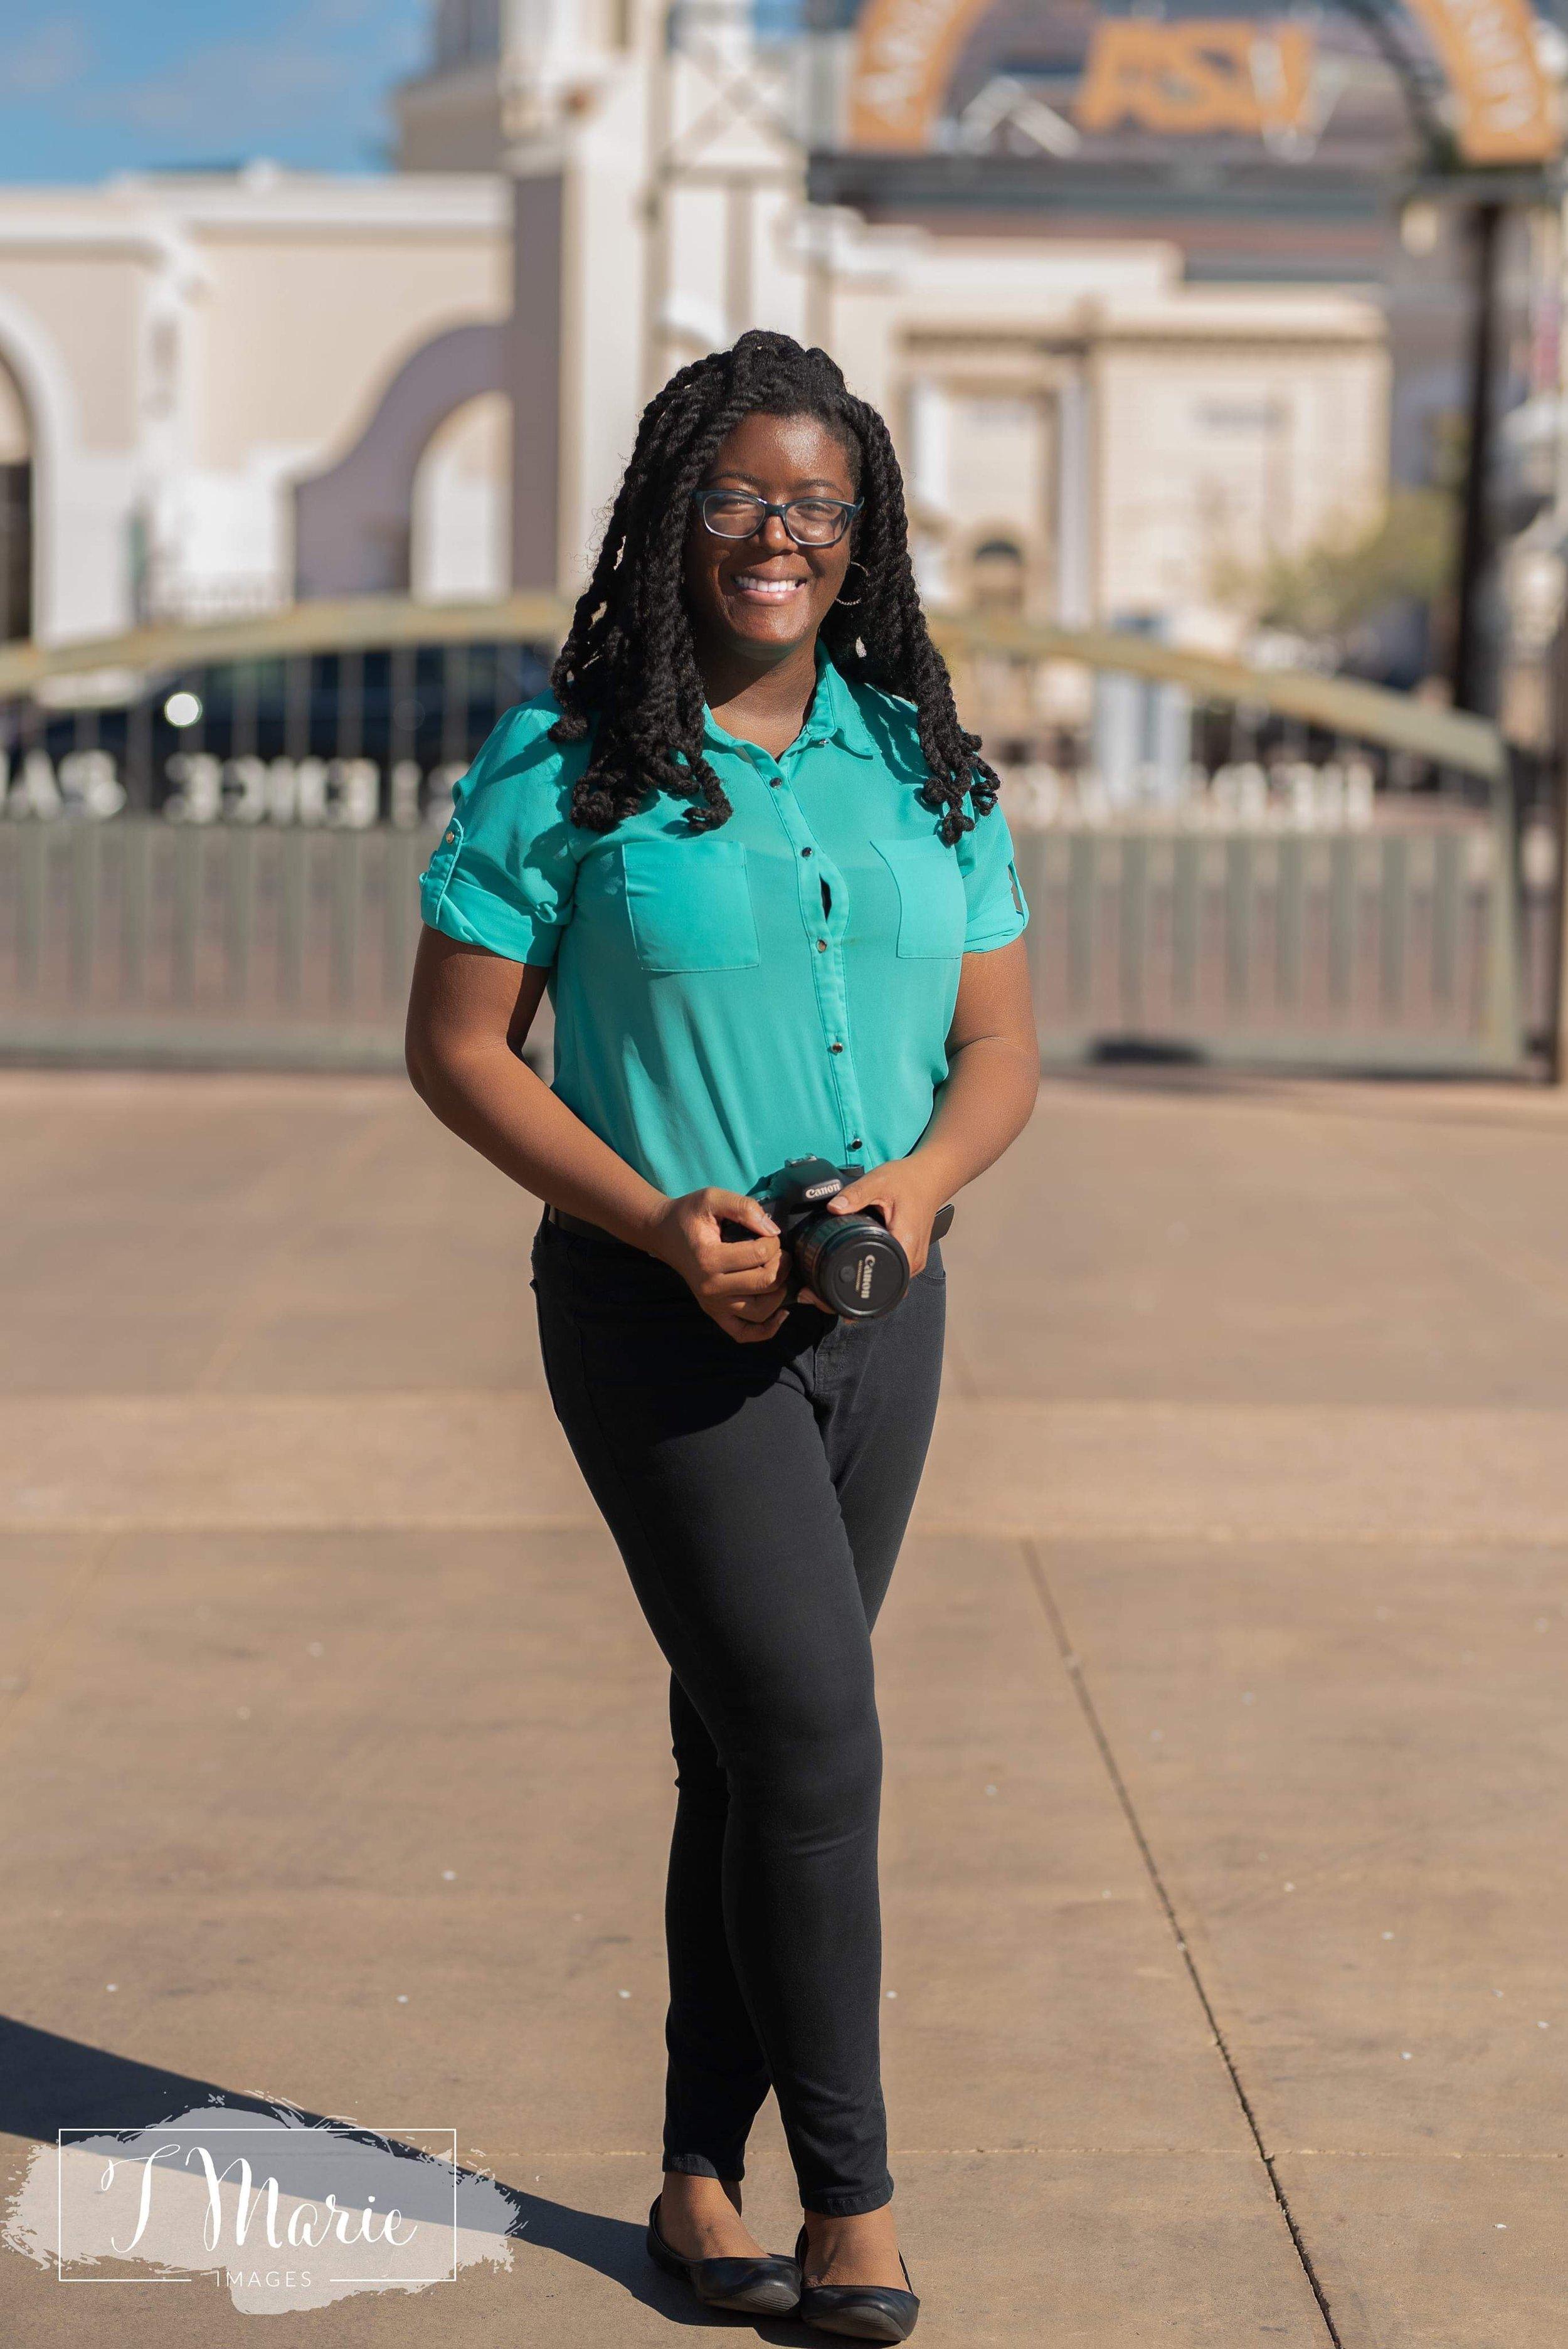 Dallas — Associate Photographer of Events